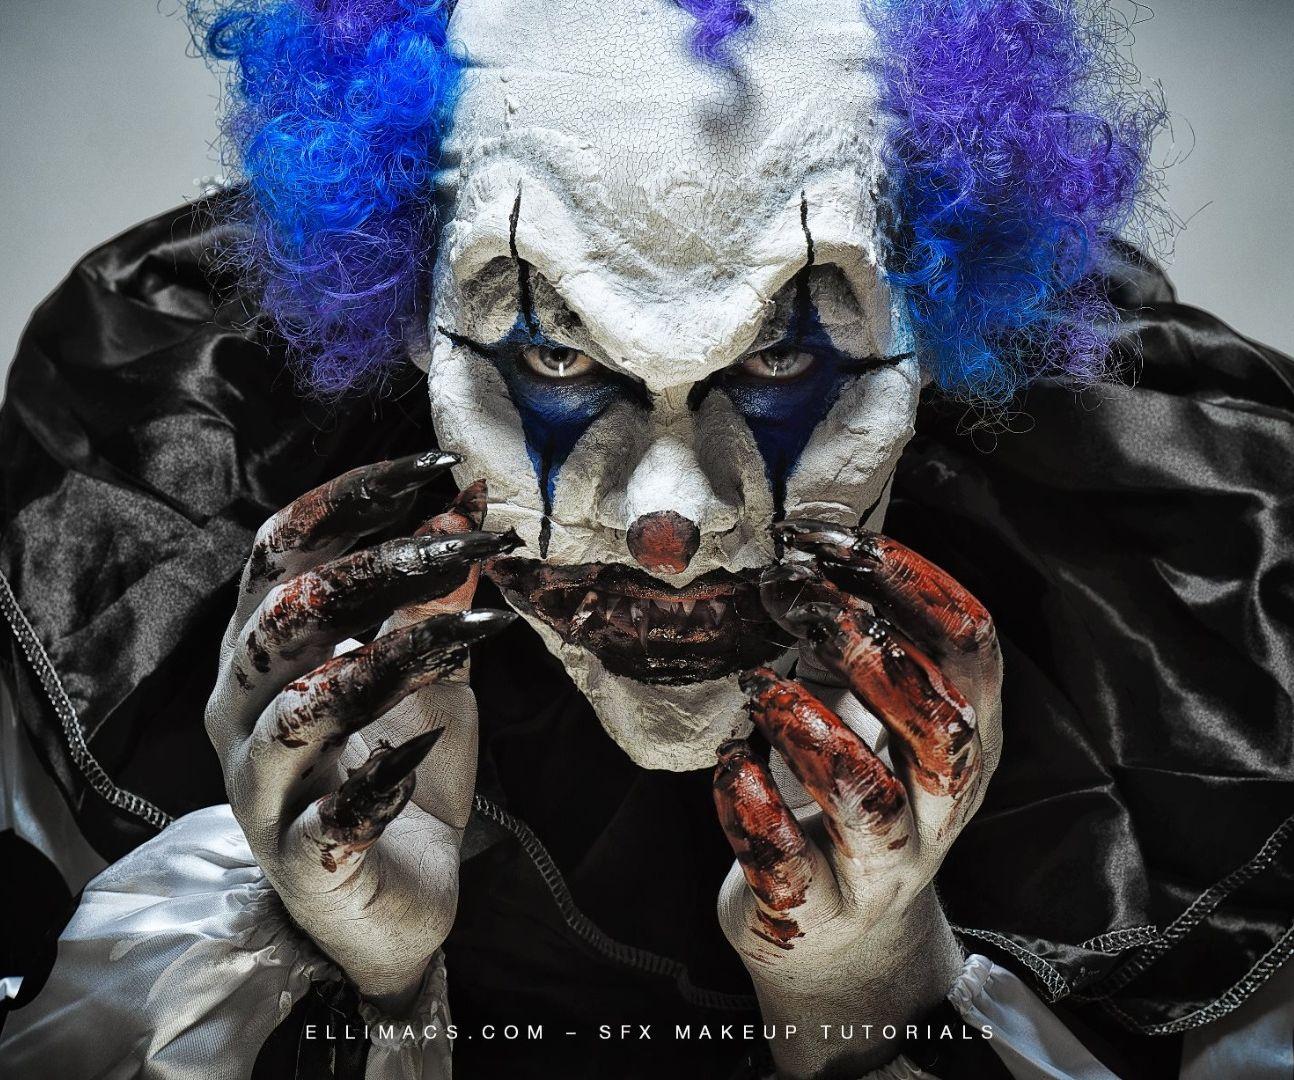 Nightmare Clown - SFX Makeup Tutorial